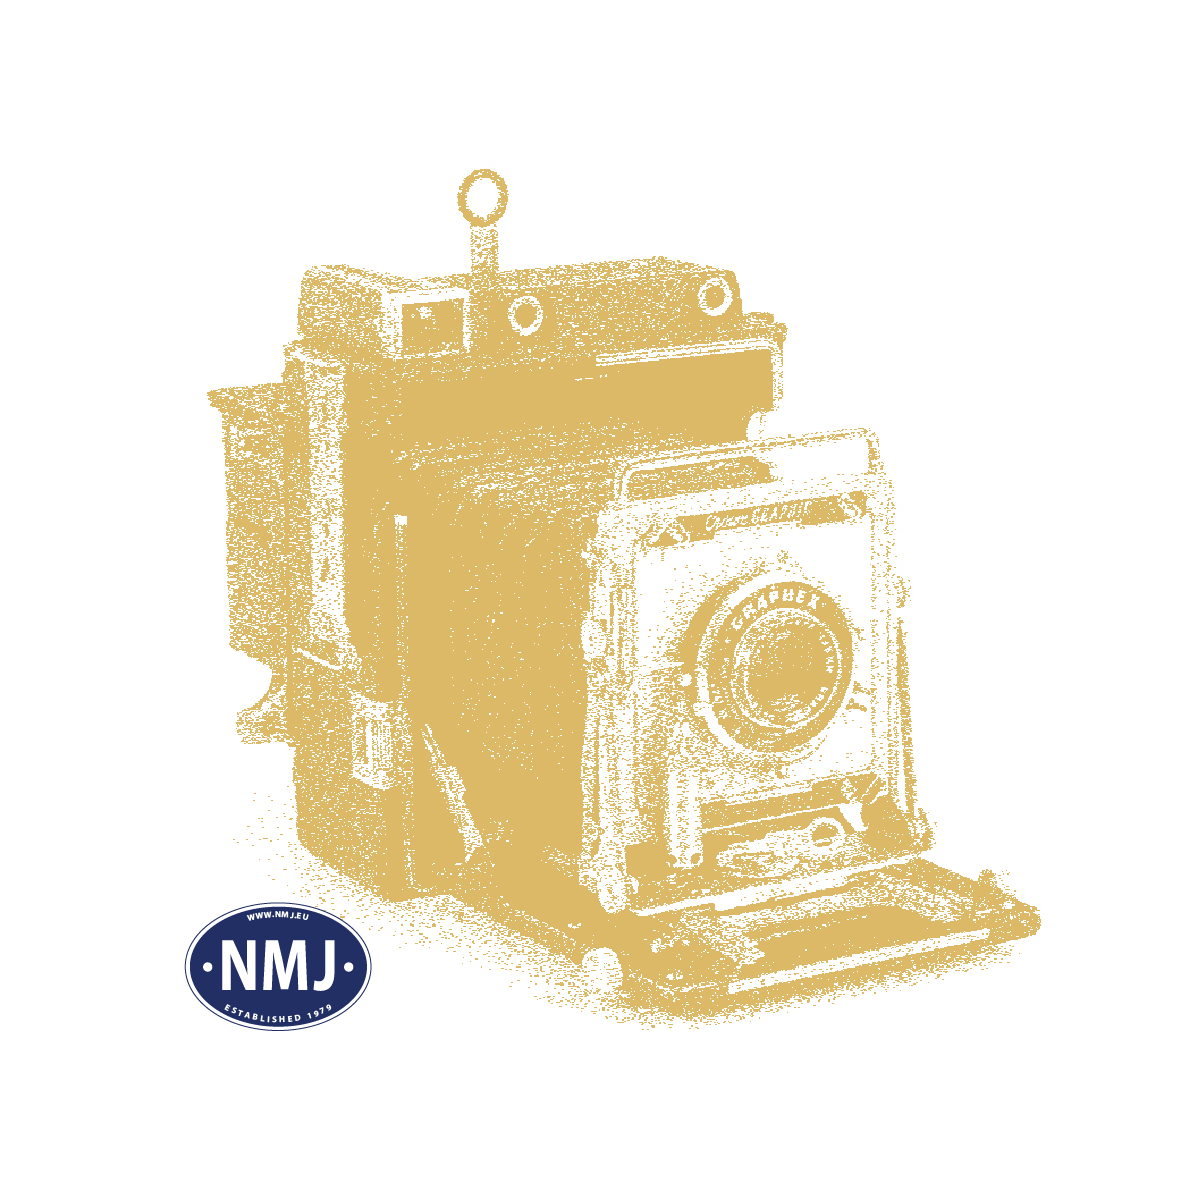 NMJT131.101 - NMJ Topline NSB B3-2 25513 type 3, Gammeldesign